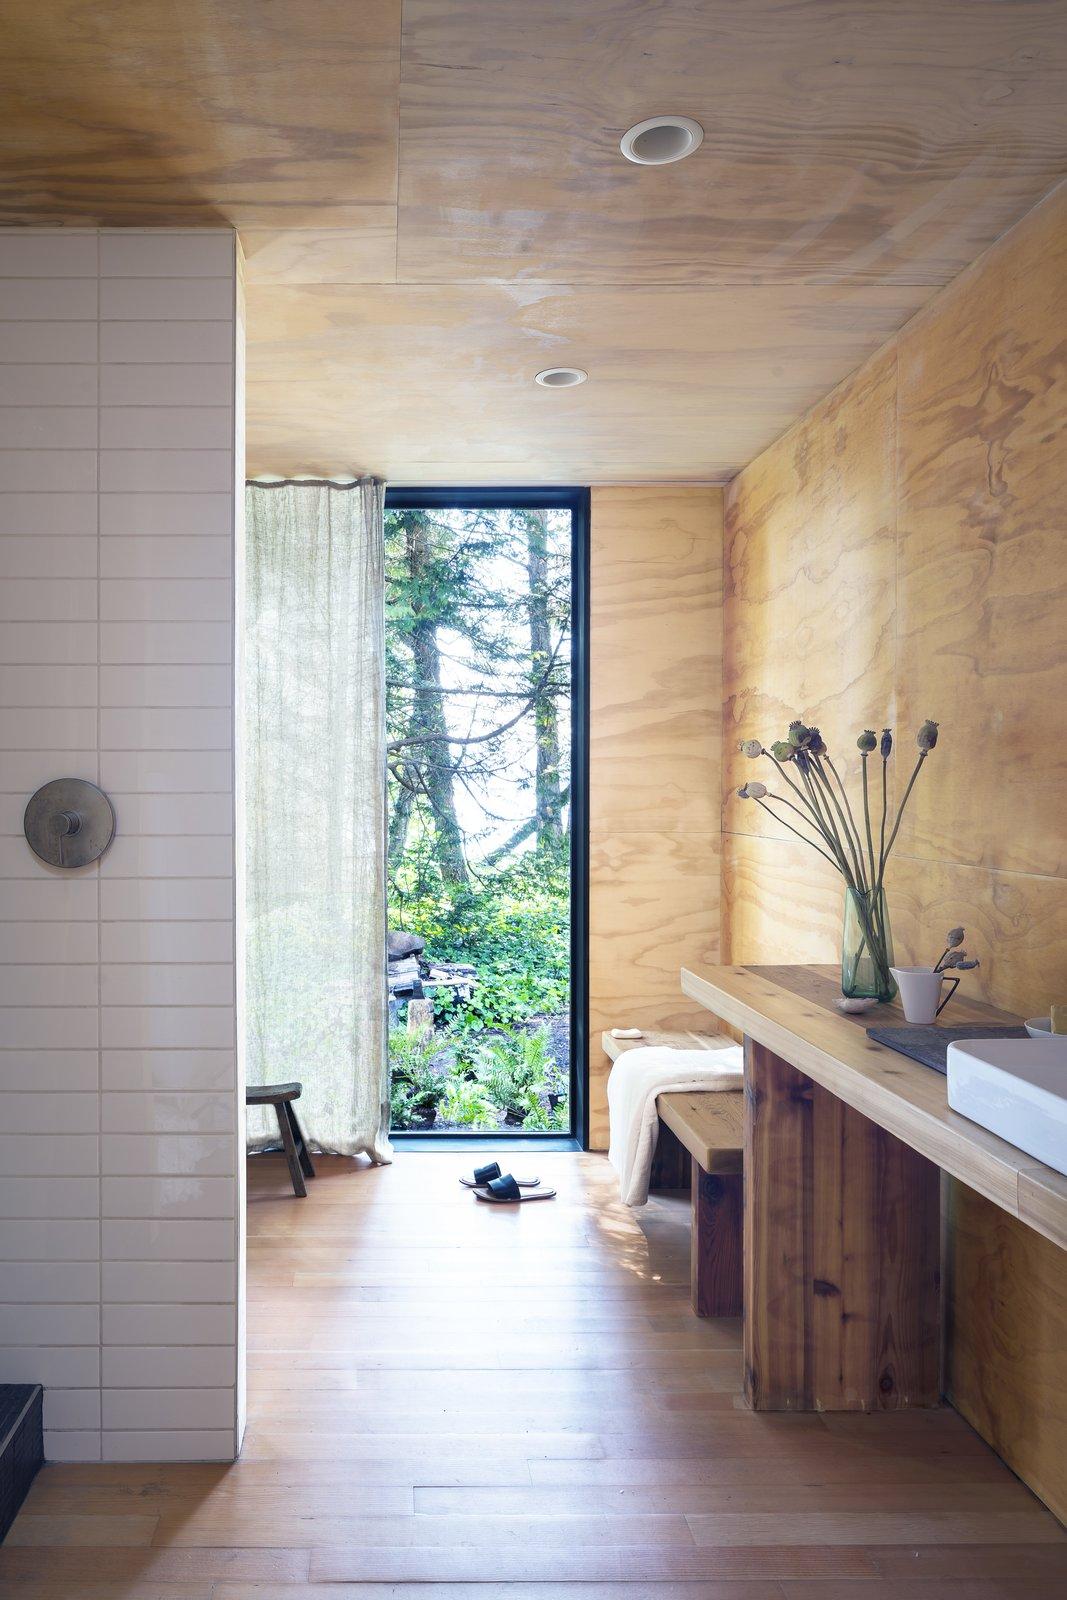 Bath Room Hood Cliff Retreat (Wittman Estes)  Hood Cliff Retreat by Wittman Estes